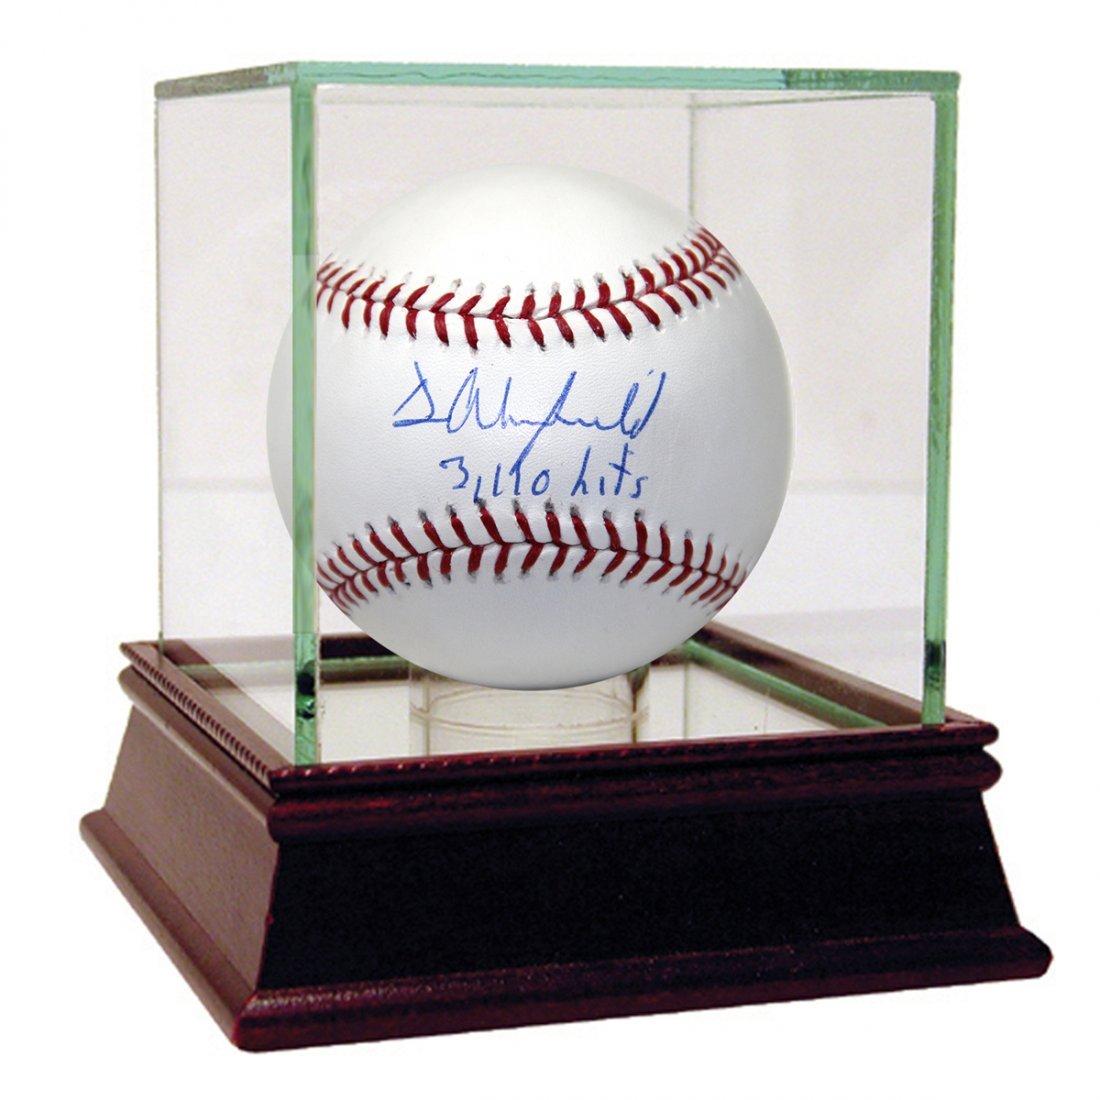 Dave Winfield Signed MLB Baseball w/ 3110 Hits Inscript